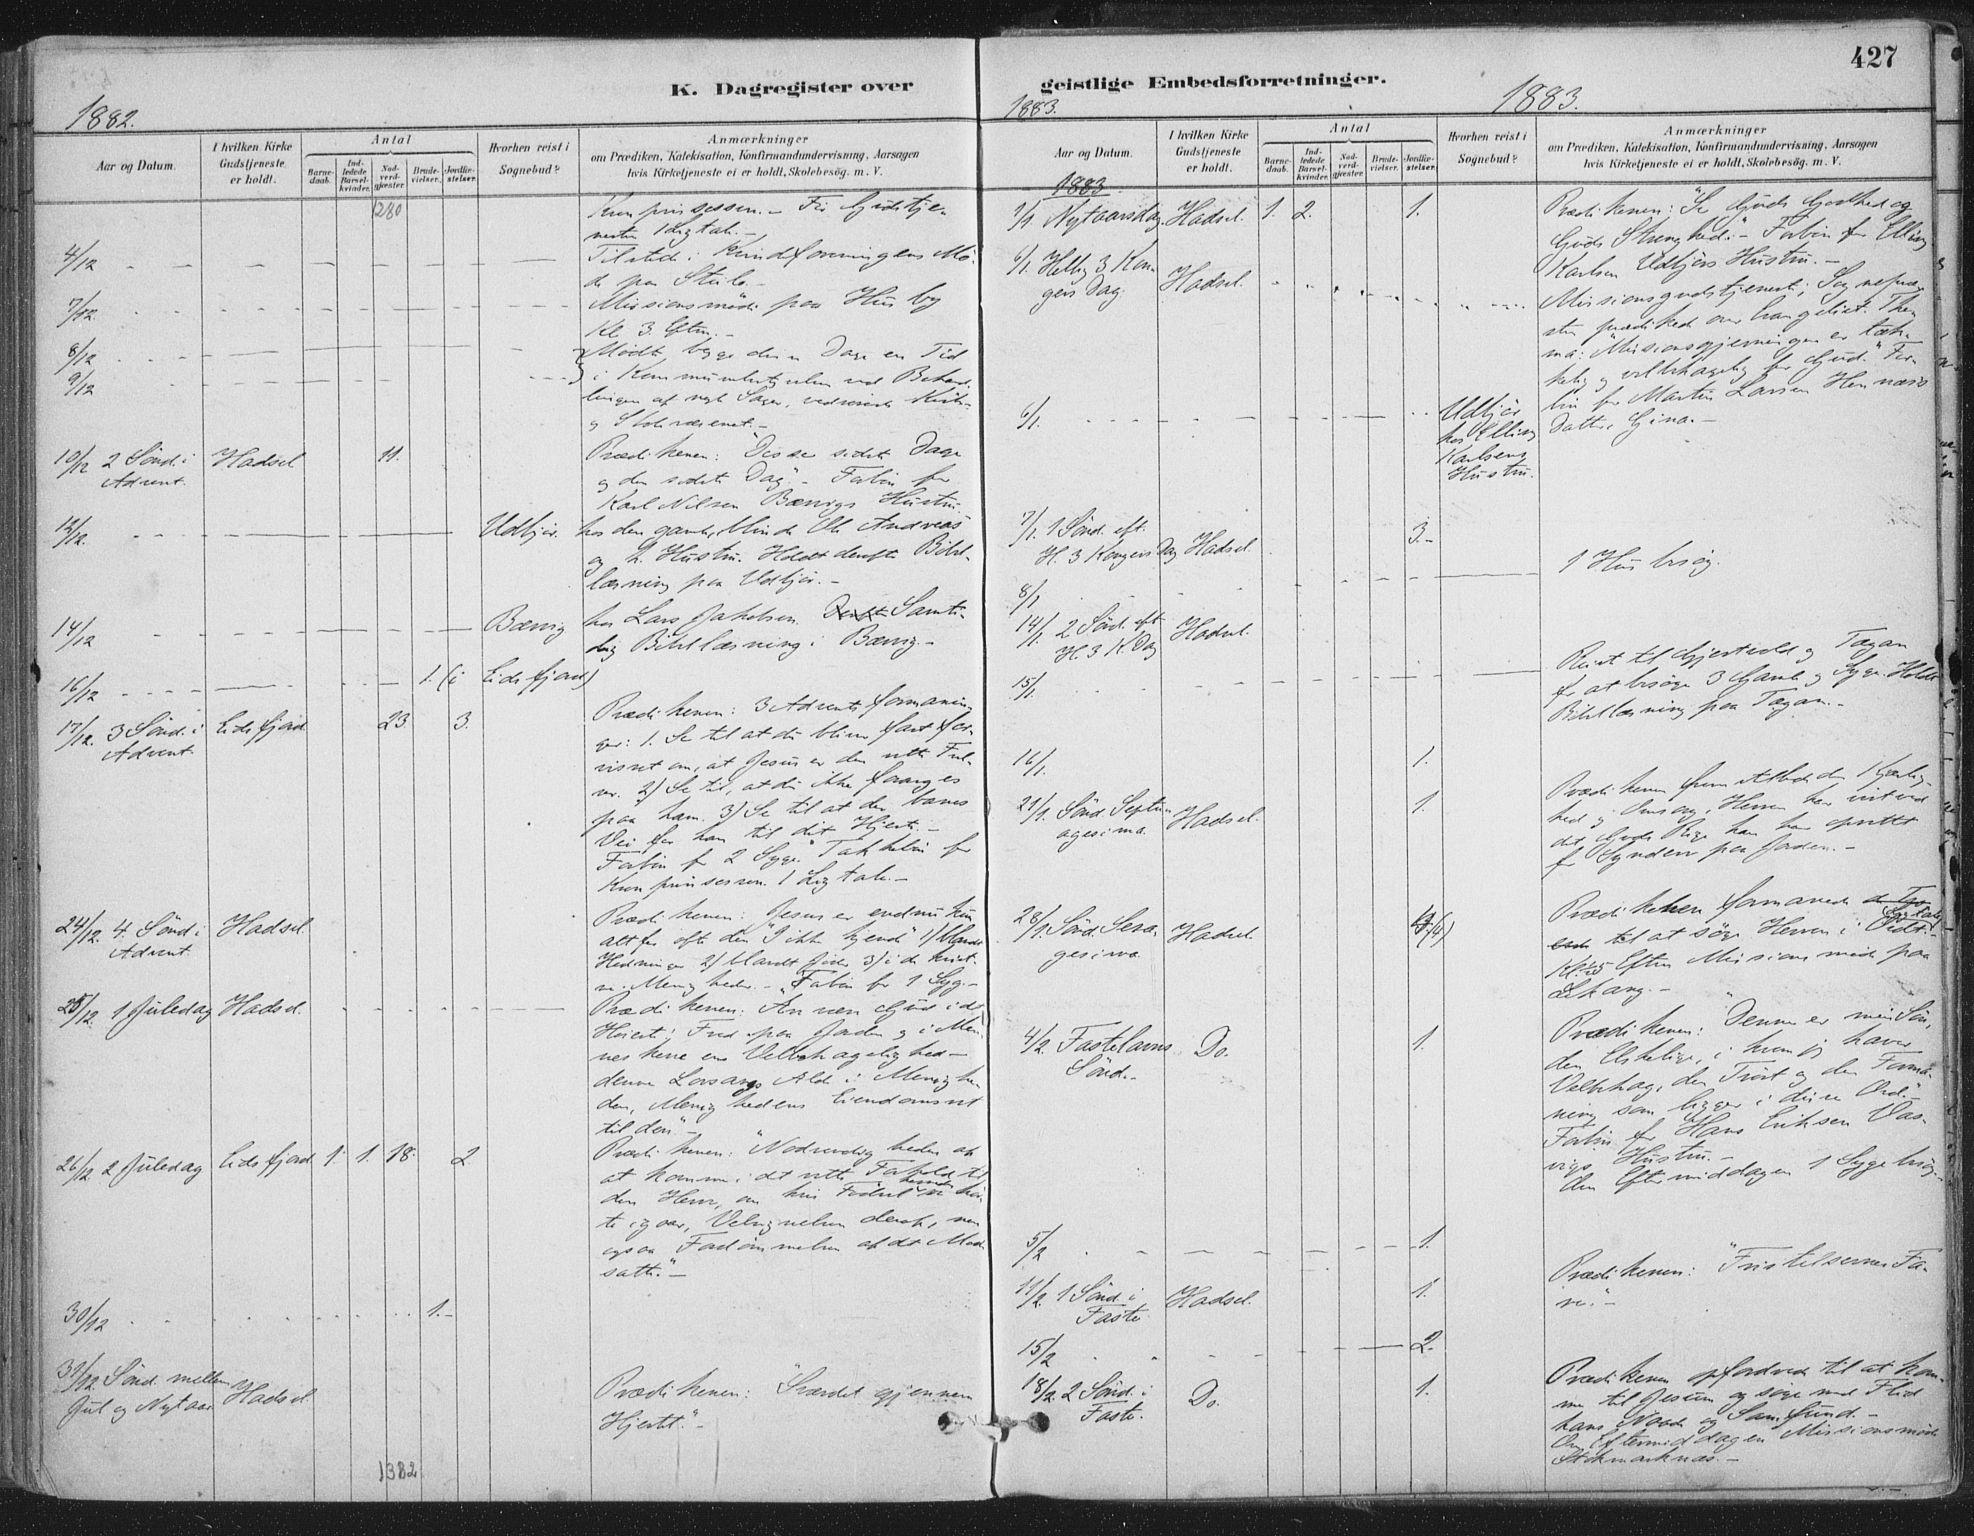 SAT, Ministerialprotokoller, klokkerbøker og fødselsregistre - Nordland, 888/L1244: Ministerialbok nr. 888A10, 1880-1890, s. 427